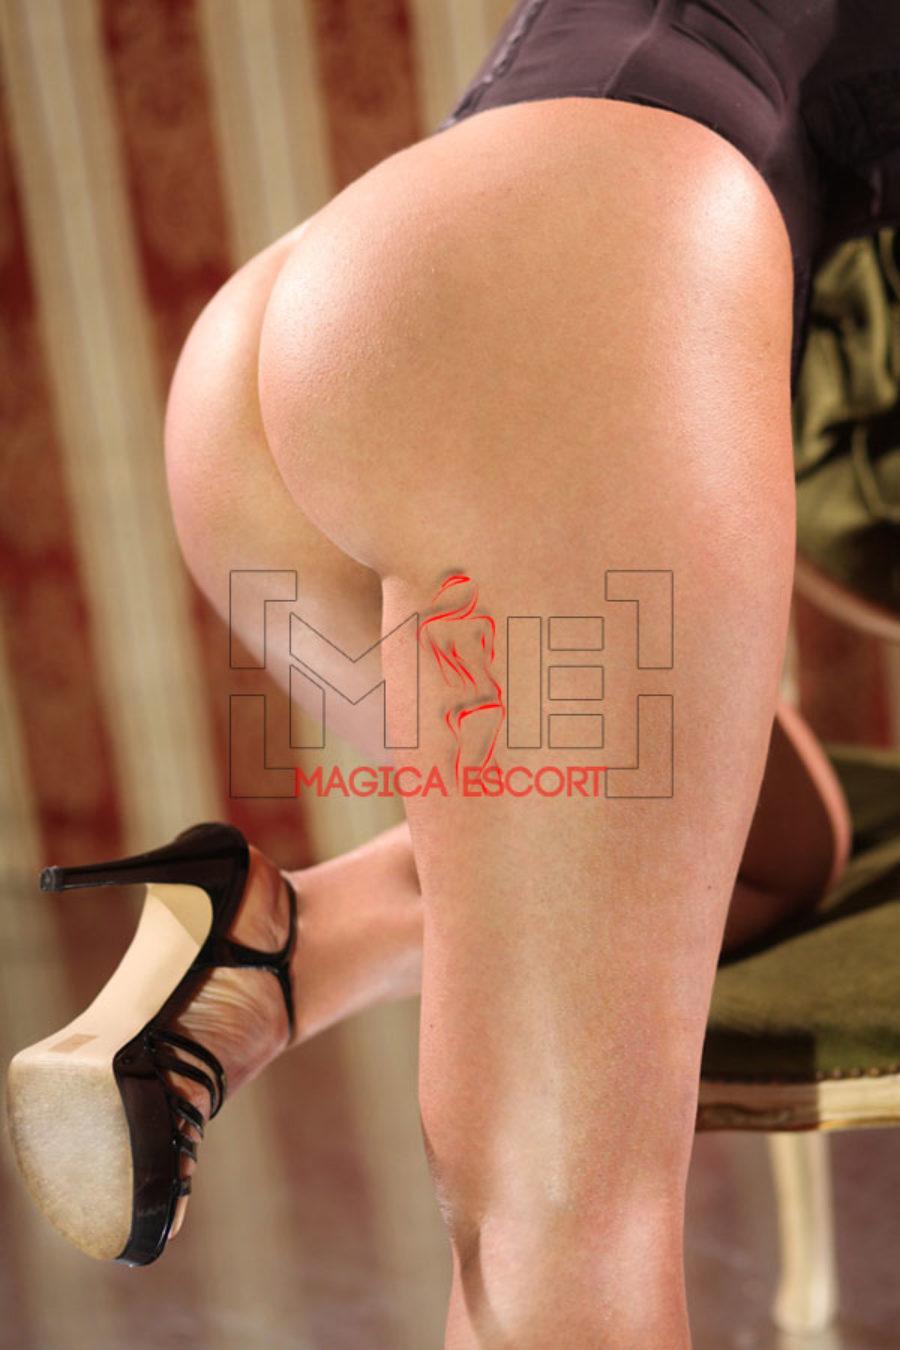 Francesca-escort-Bergamo